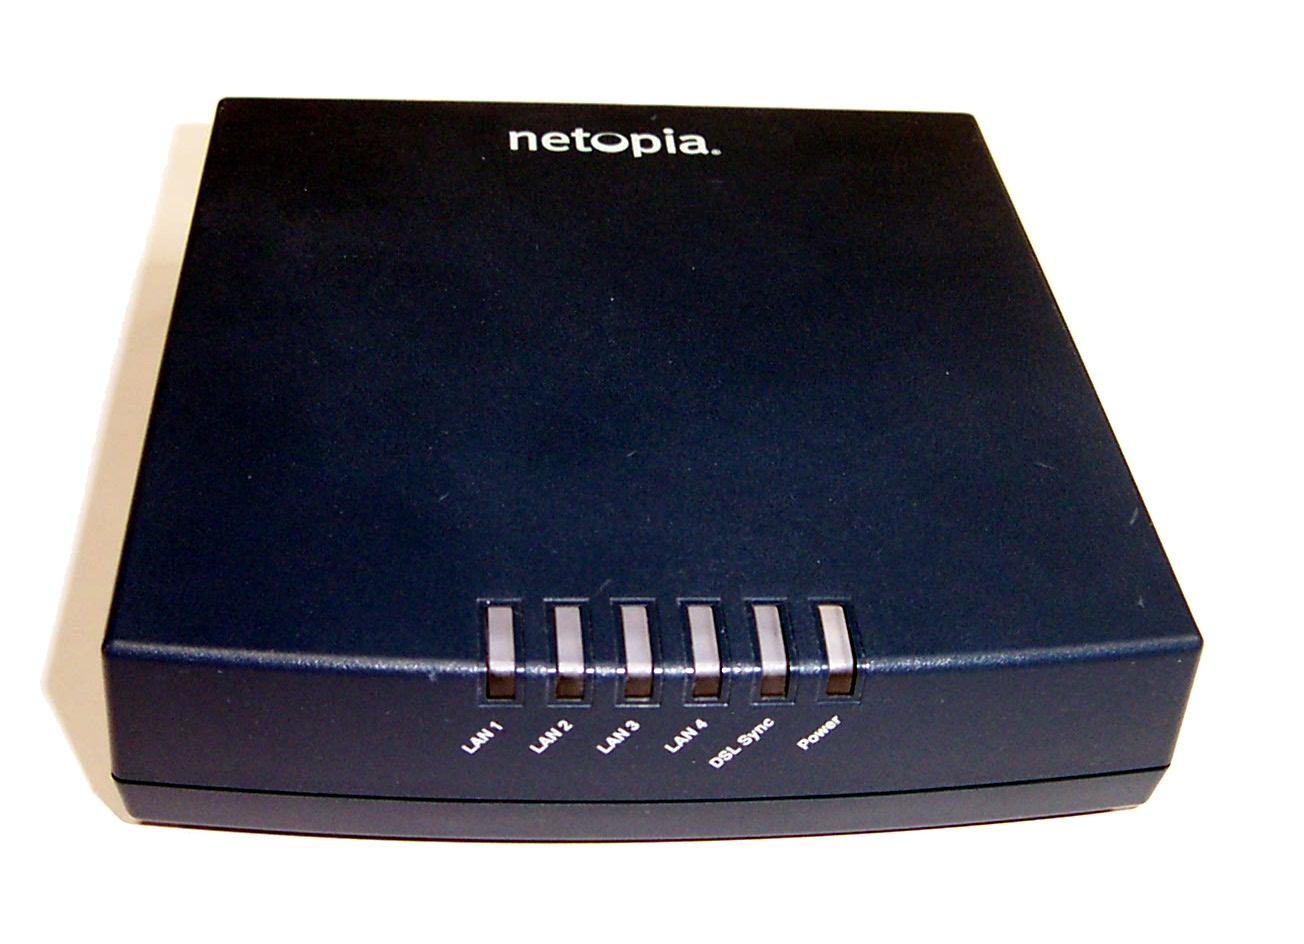 Netopia 3347nwg 006 - wowkeyword.com